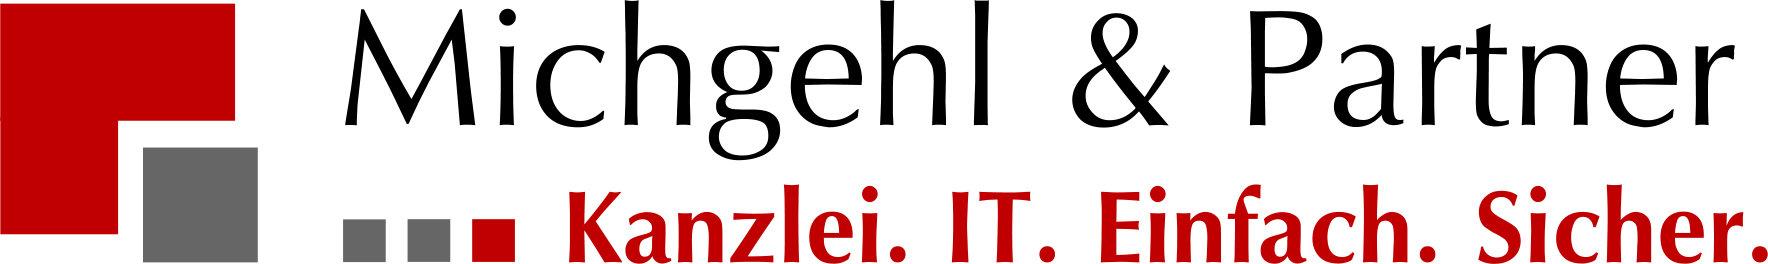 Michgehl & Partner GmbH Logo